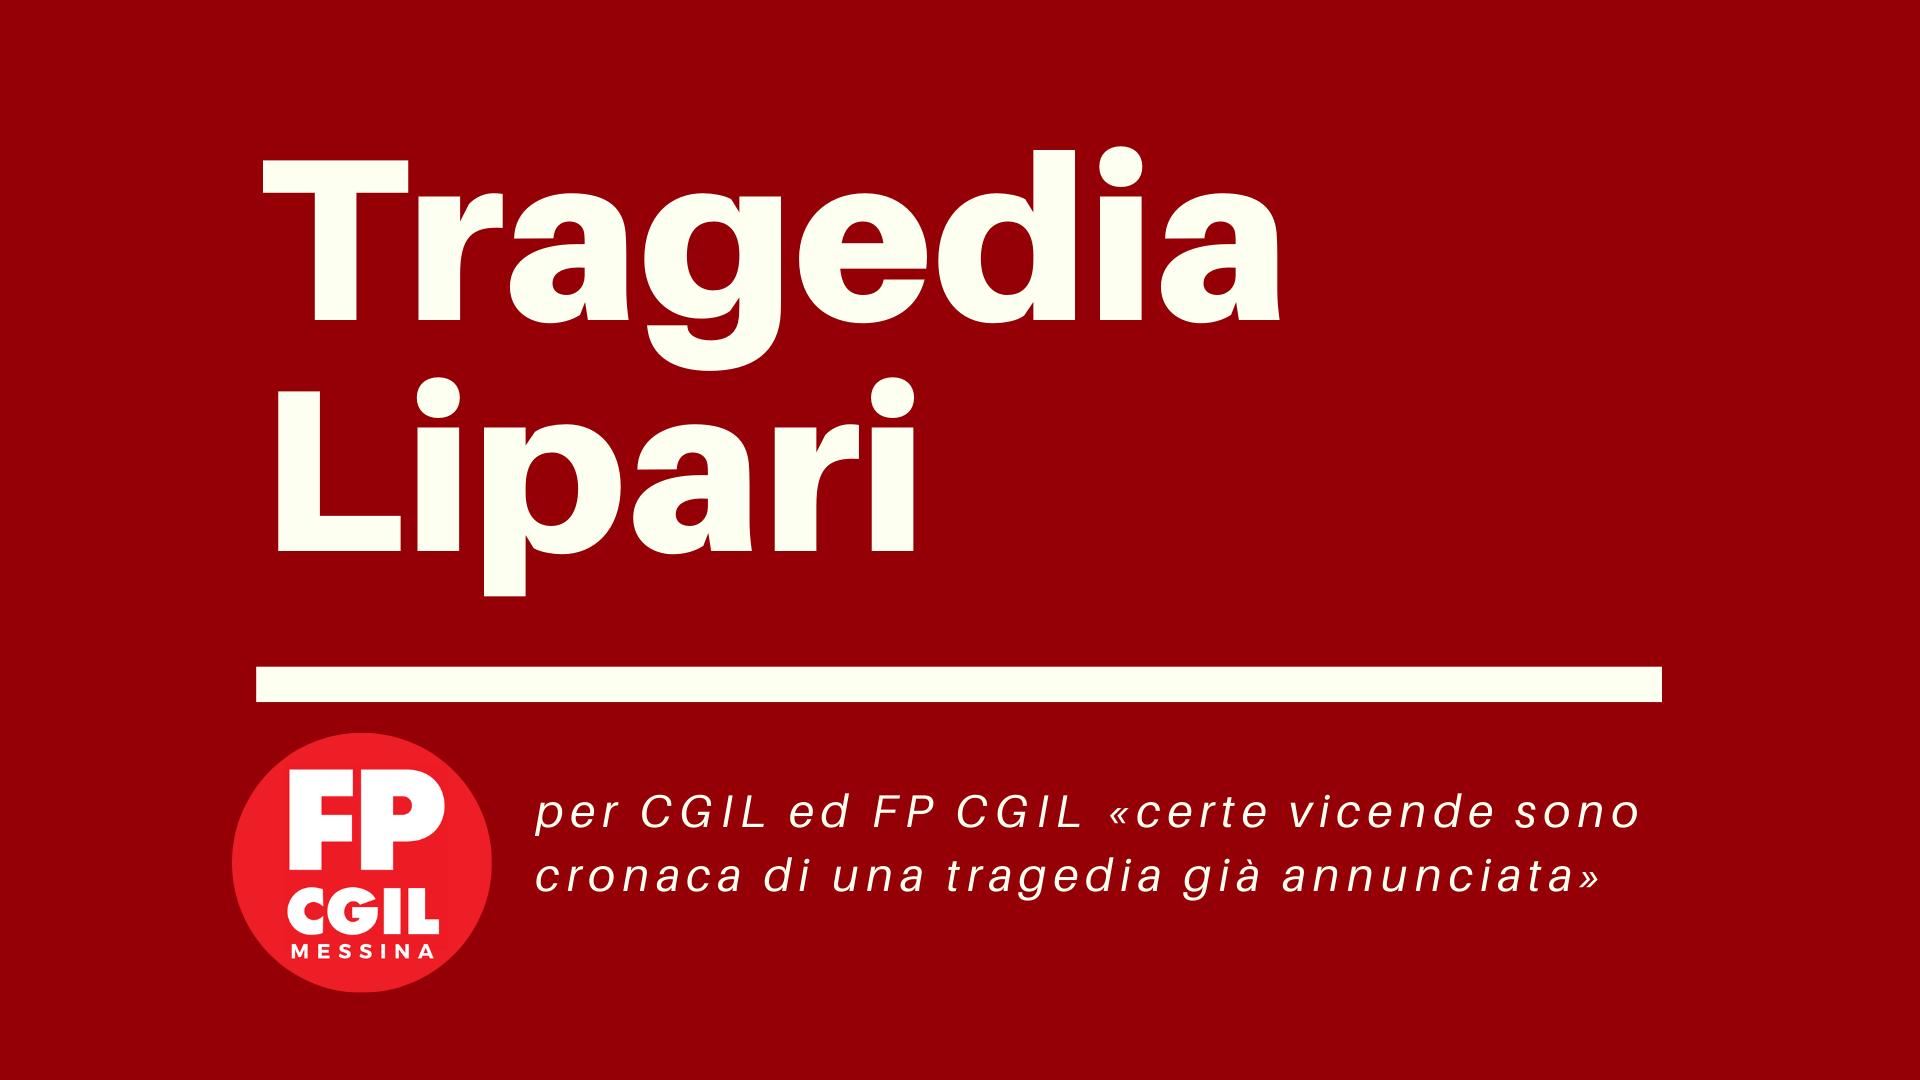 Tragedia Lipari, per CGIL ed FP CGIL «certe vicende sono cronaca di una tragedia già annunciata»